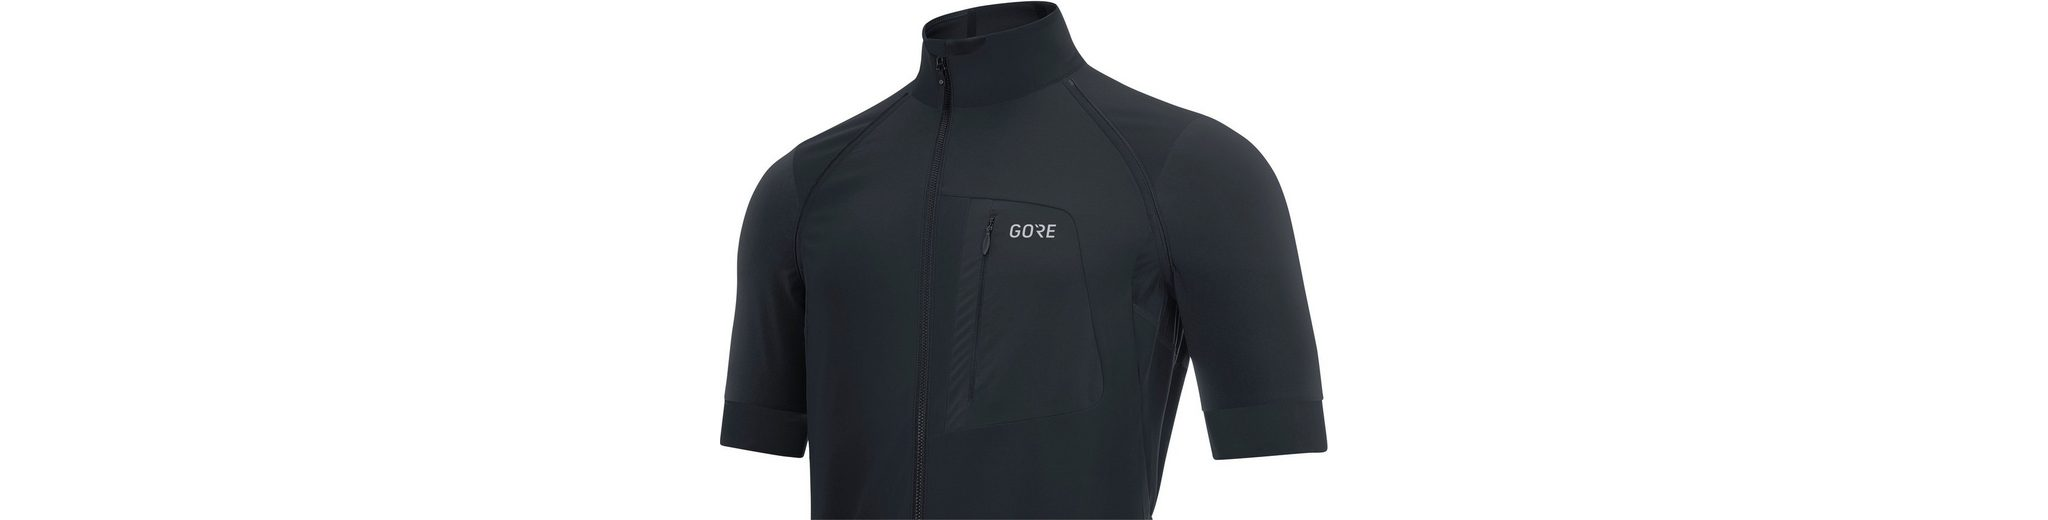 GORE Shirt Pro Off Jersey Men T WEAR C7 Zip R6qrRwE